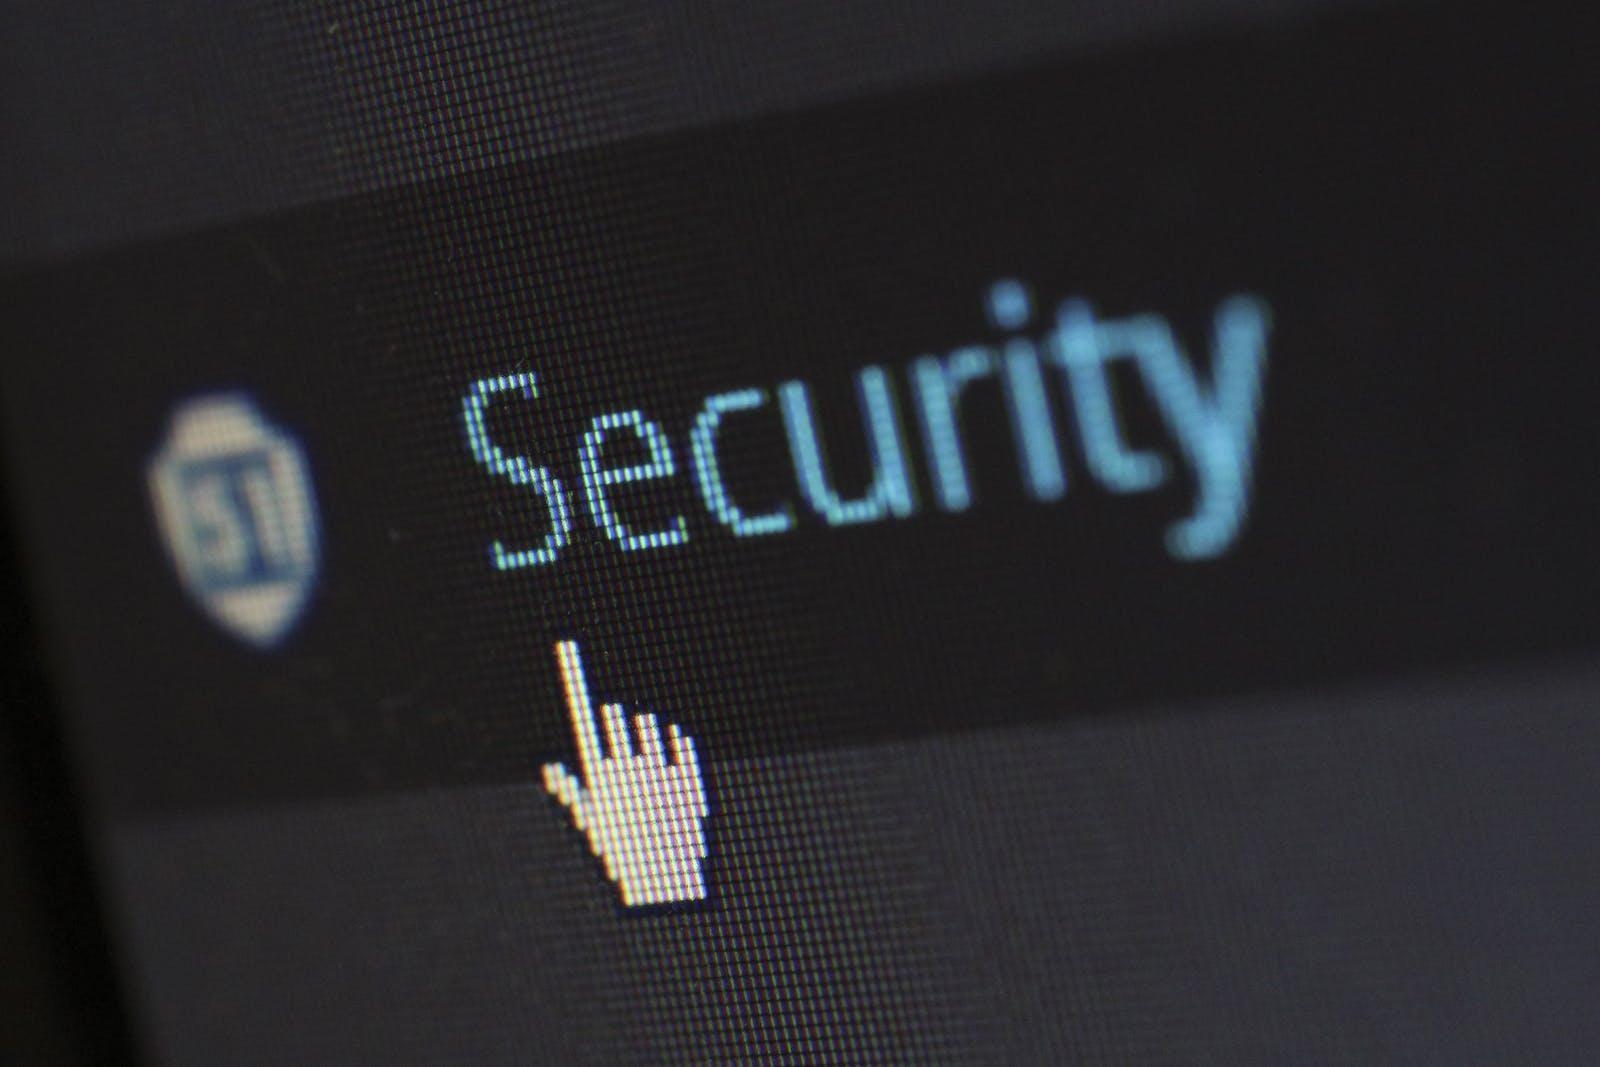 127421_security-protection-anti-virus-software-60504.jpeg